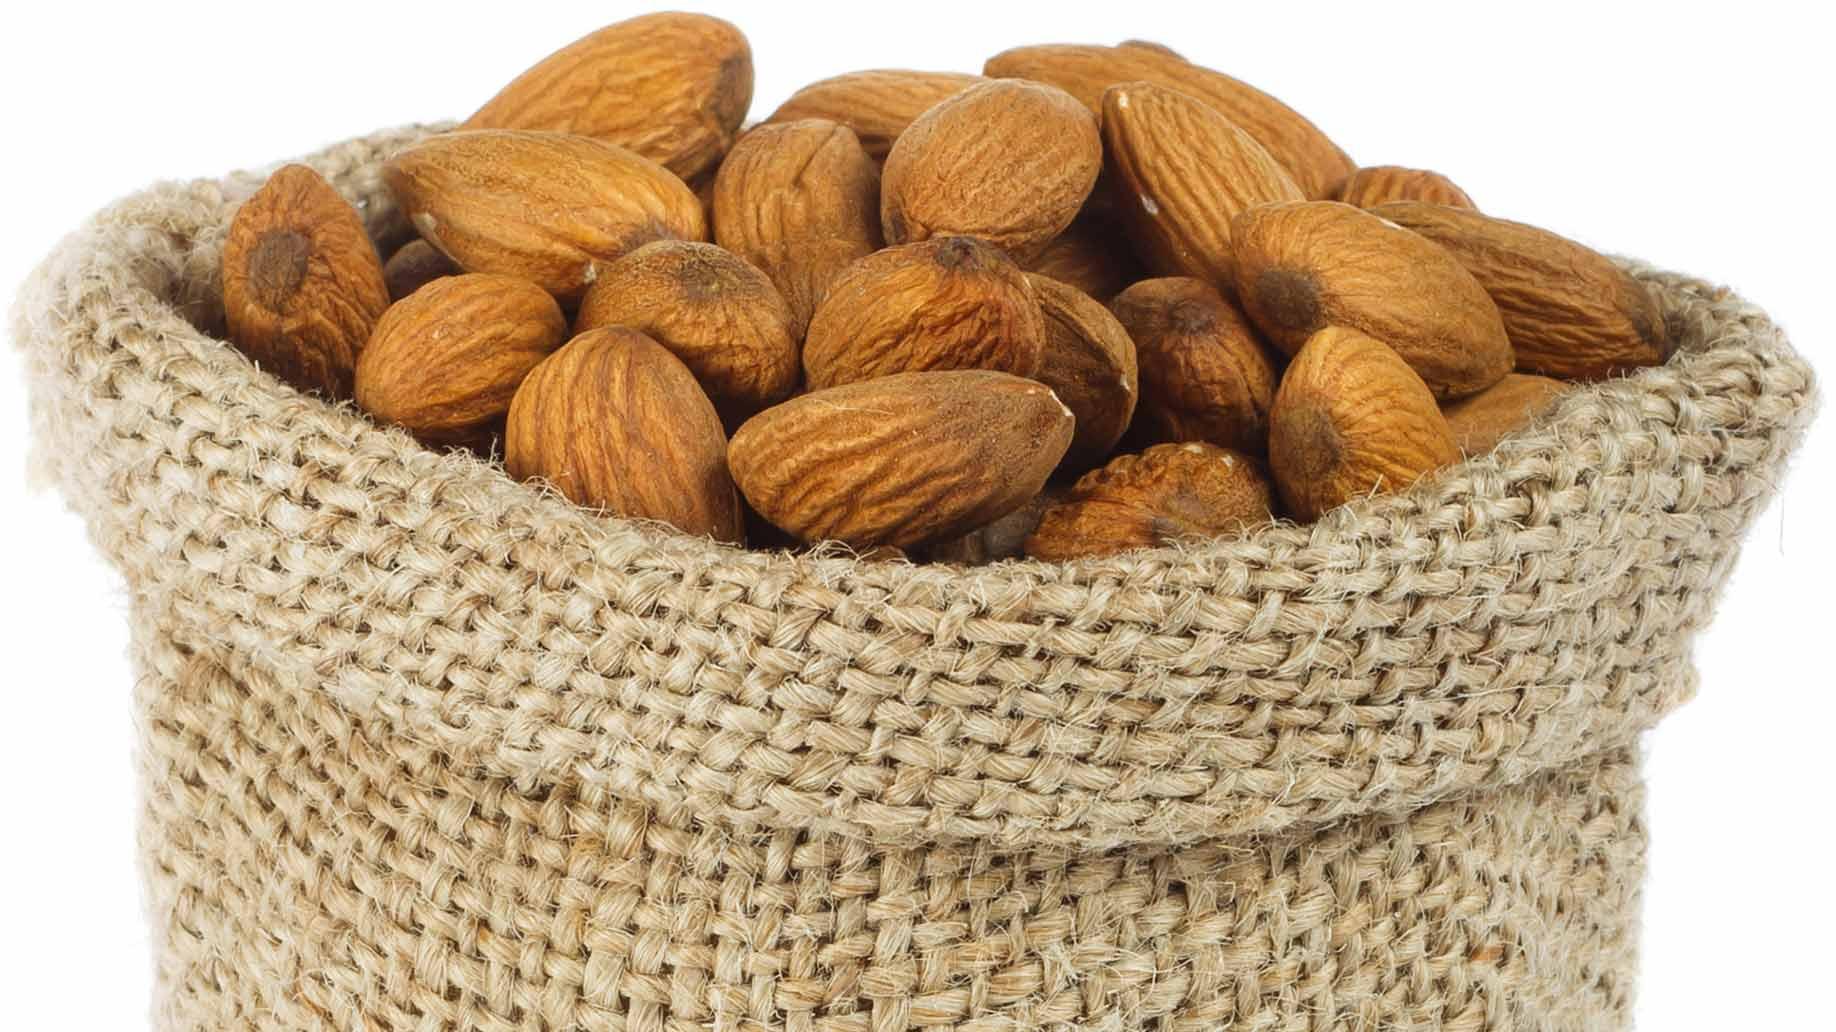 18 Best Natural Home Remedies For Heartburn Amp Acid Reflux